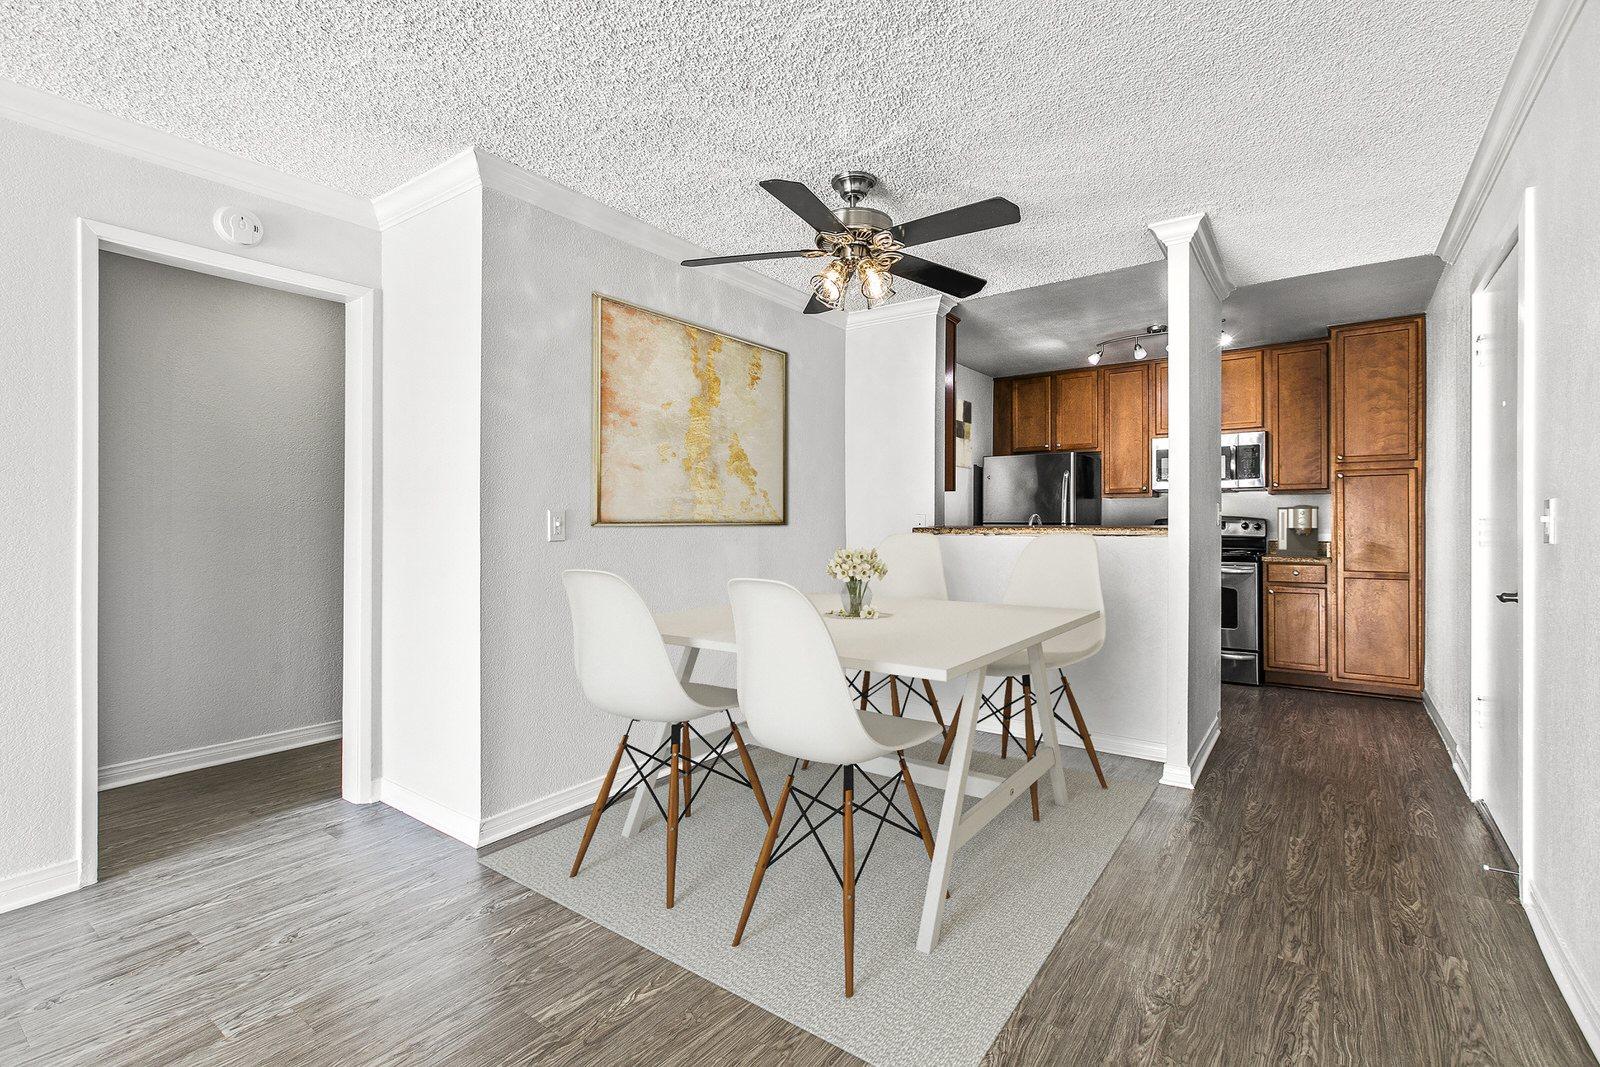 Living Area Interior Photo at Milano Apartments 20900 Anza Ave Torrance, CA 90503